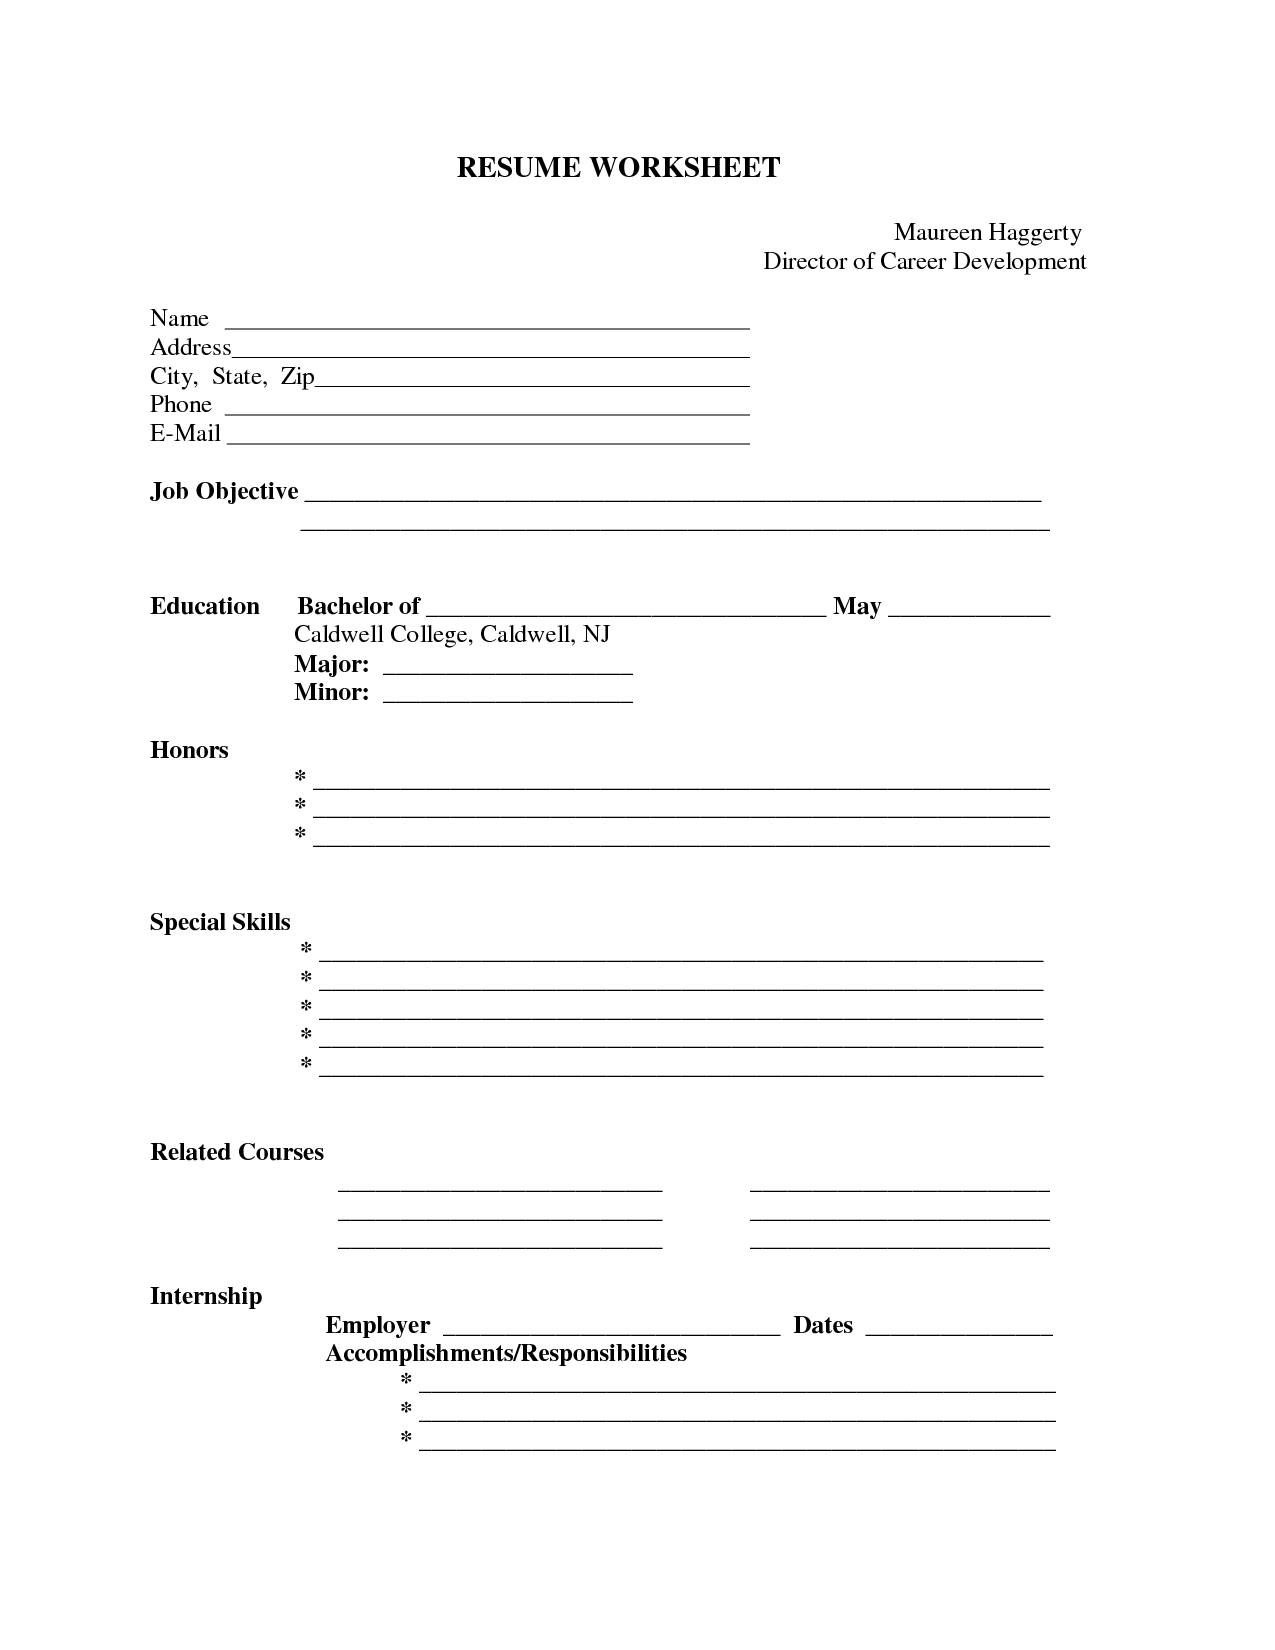 Printable Resumes - Kaza.psstech.co - Free Printable Blank Resume